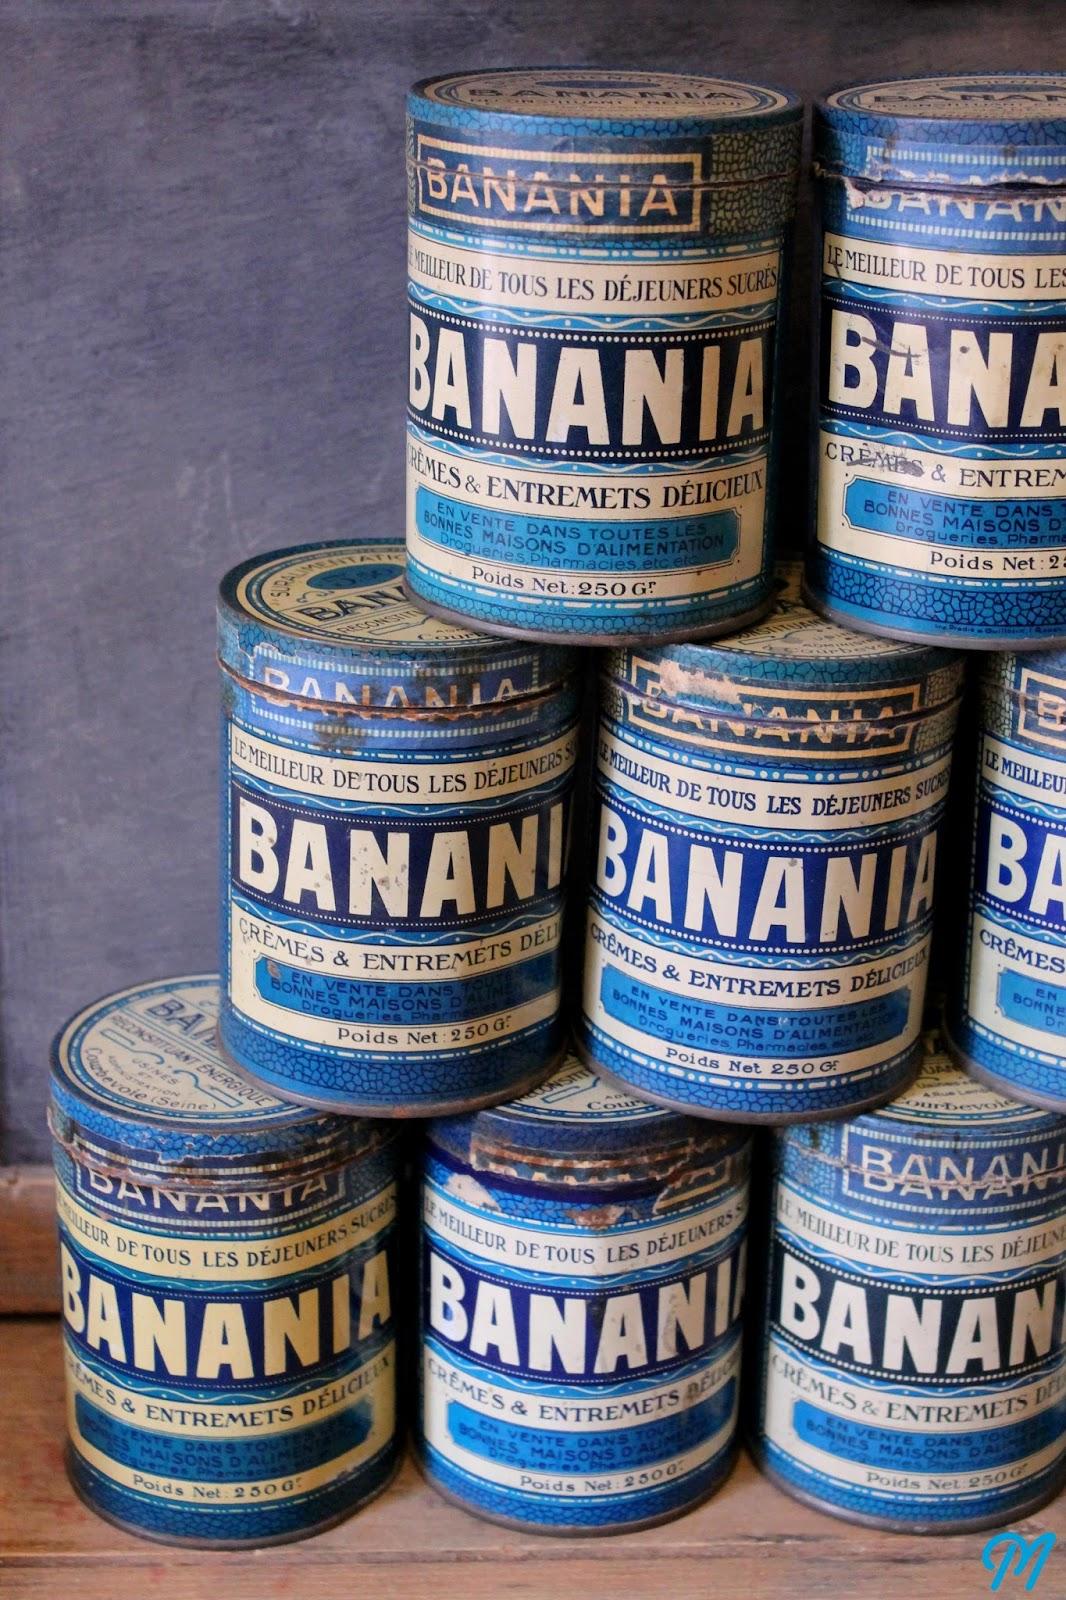 boites banania flacons anciens et savons le chat. Black Bedroom Furniture Sets. Home Design Ideas